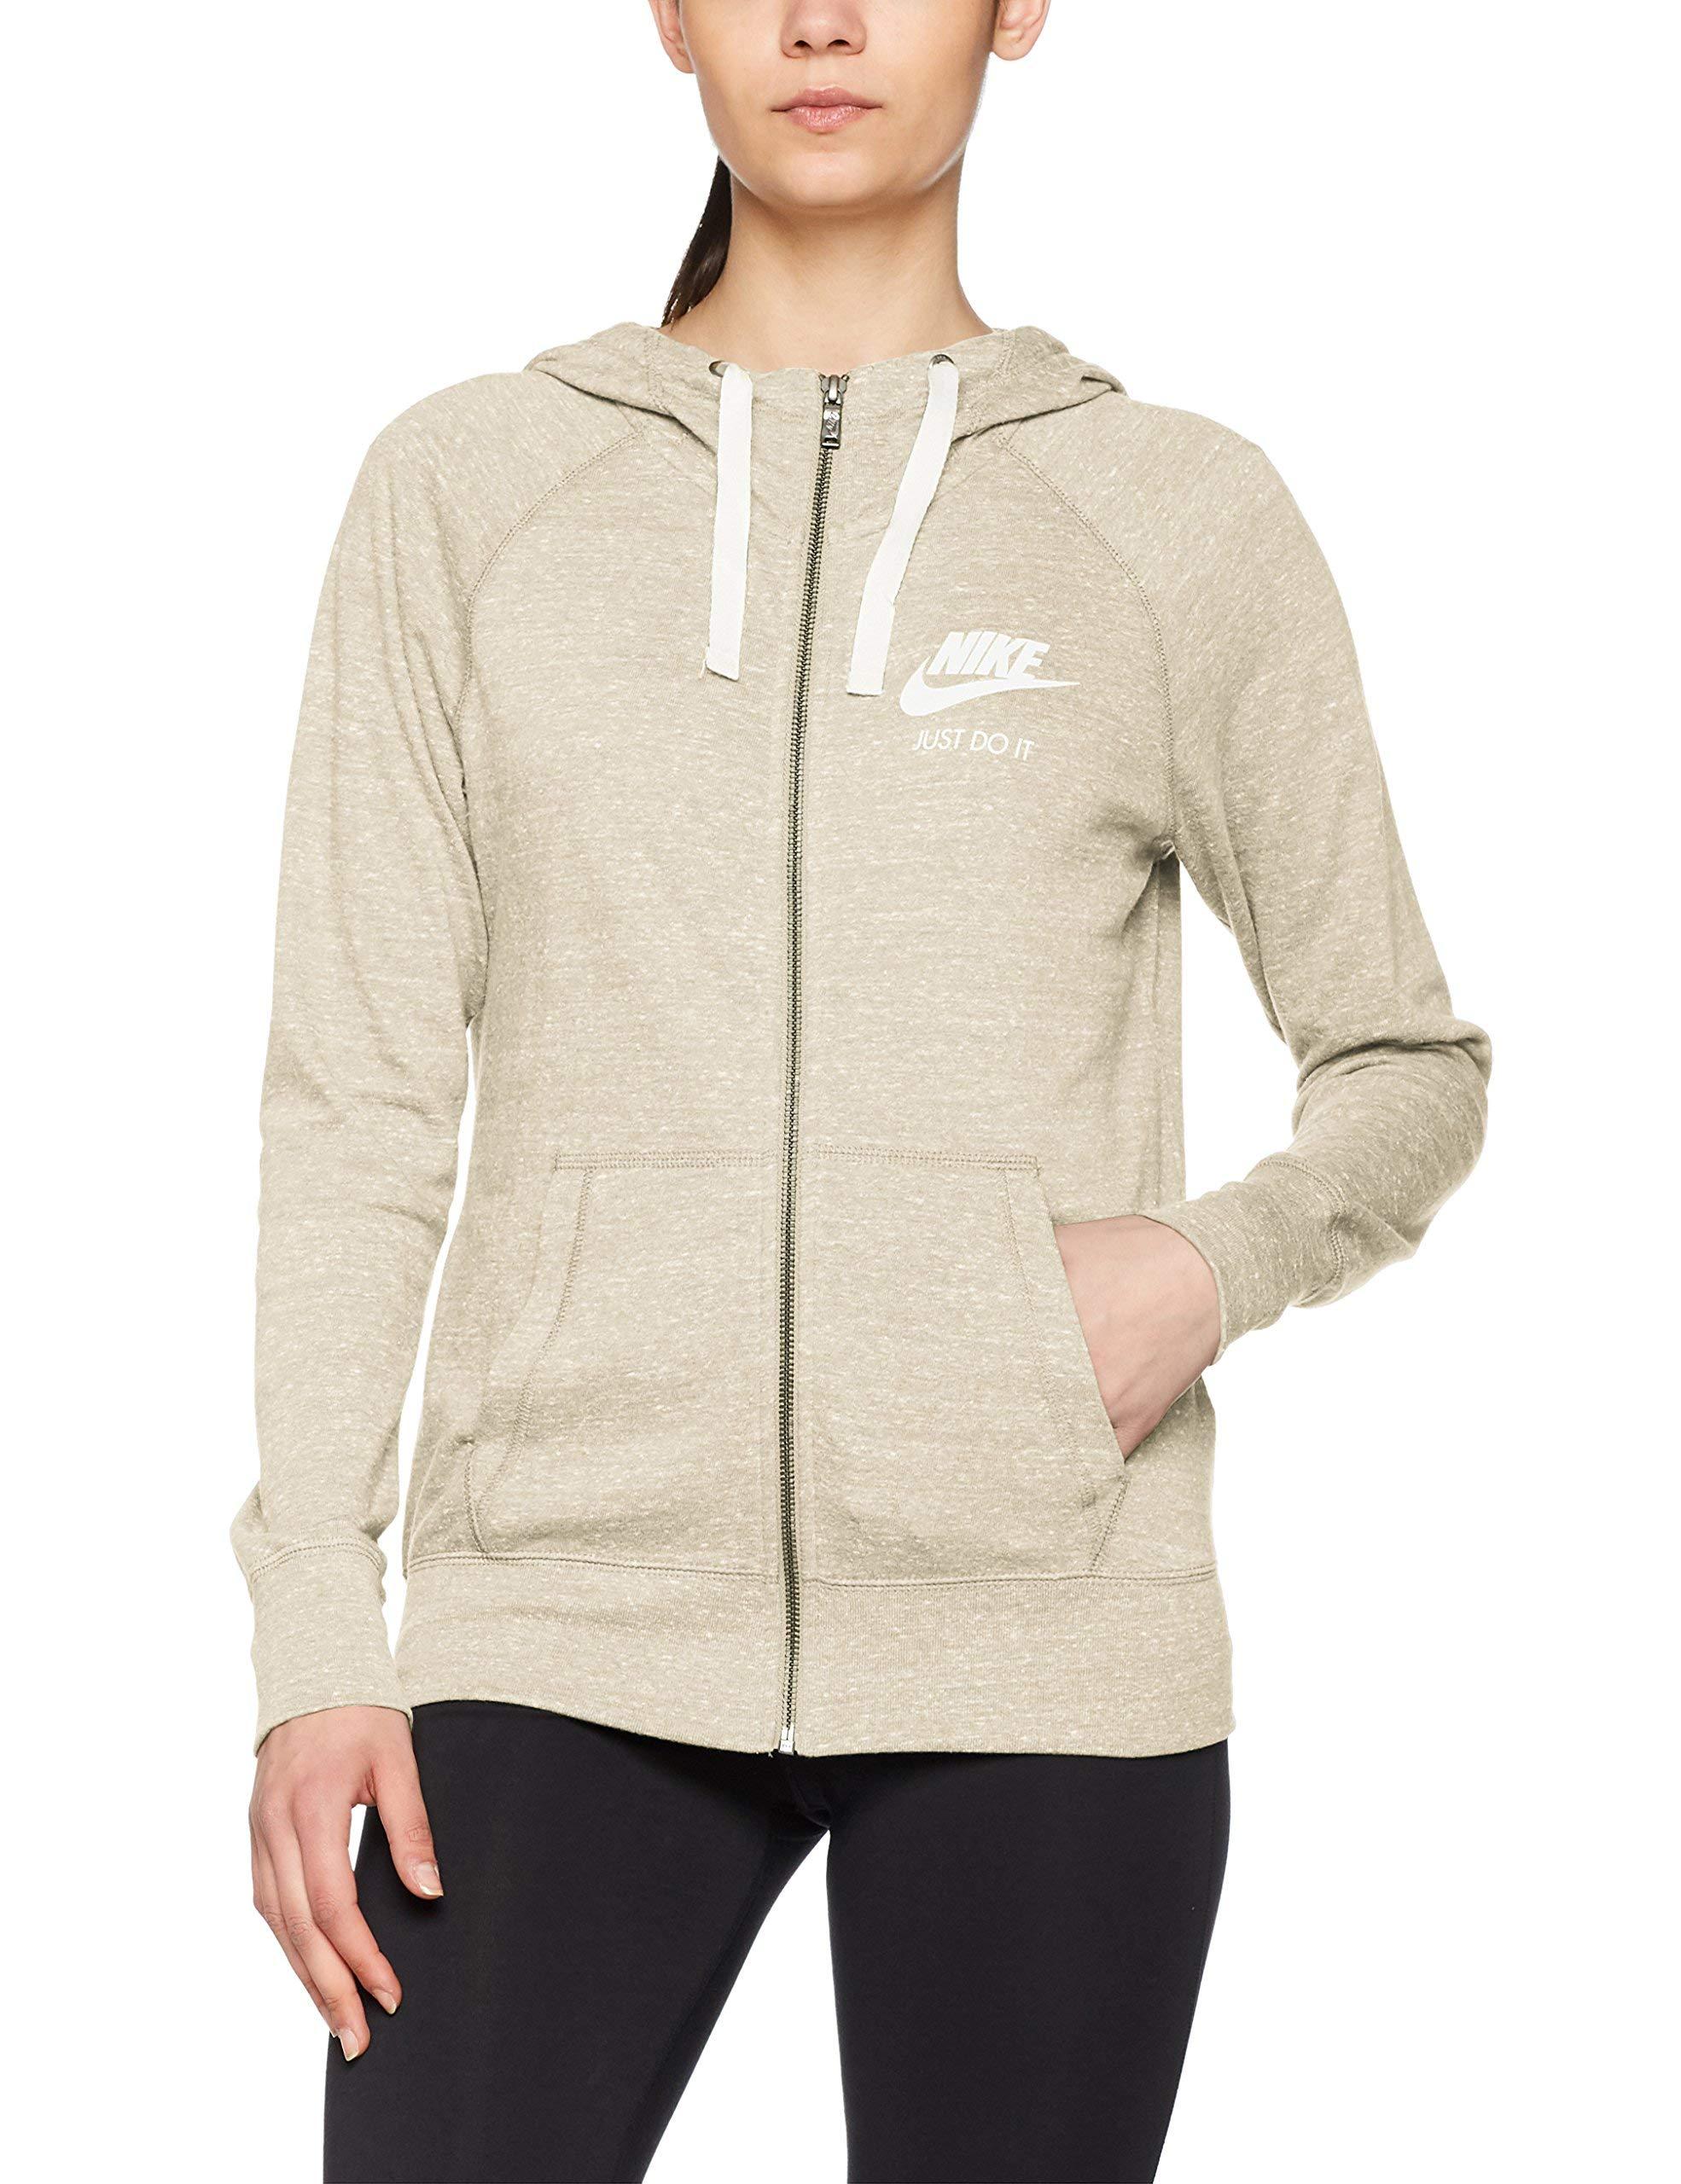 Nike W NSW Gym Vintage FZ, Women's Hoodie, AnthraciteSail, Small